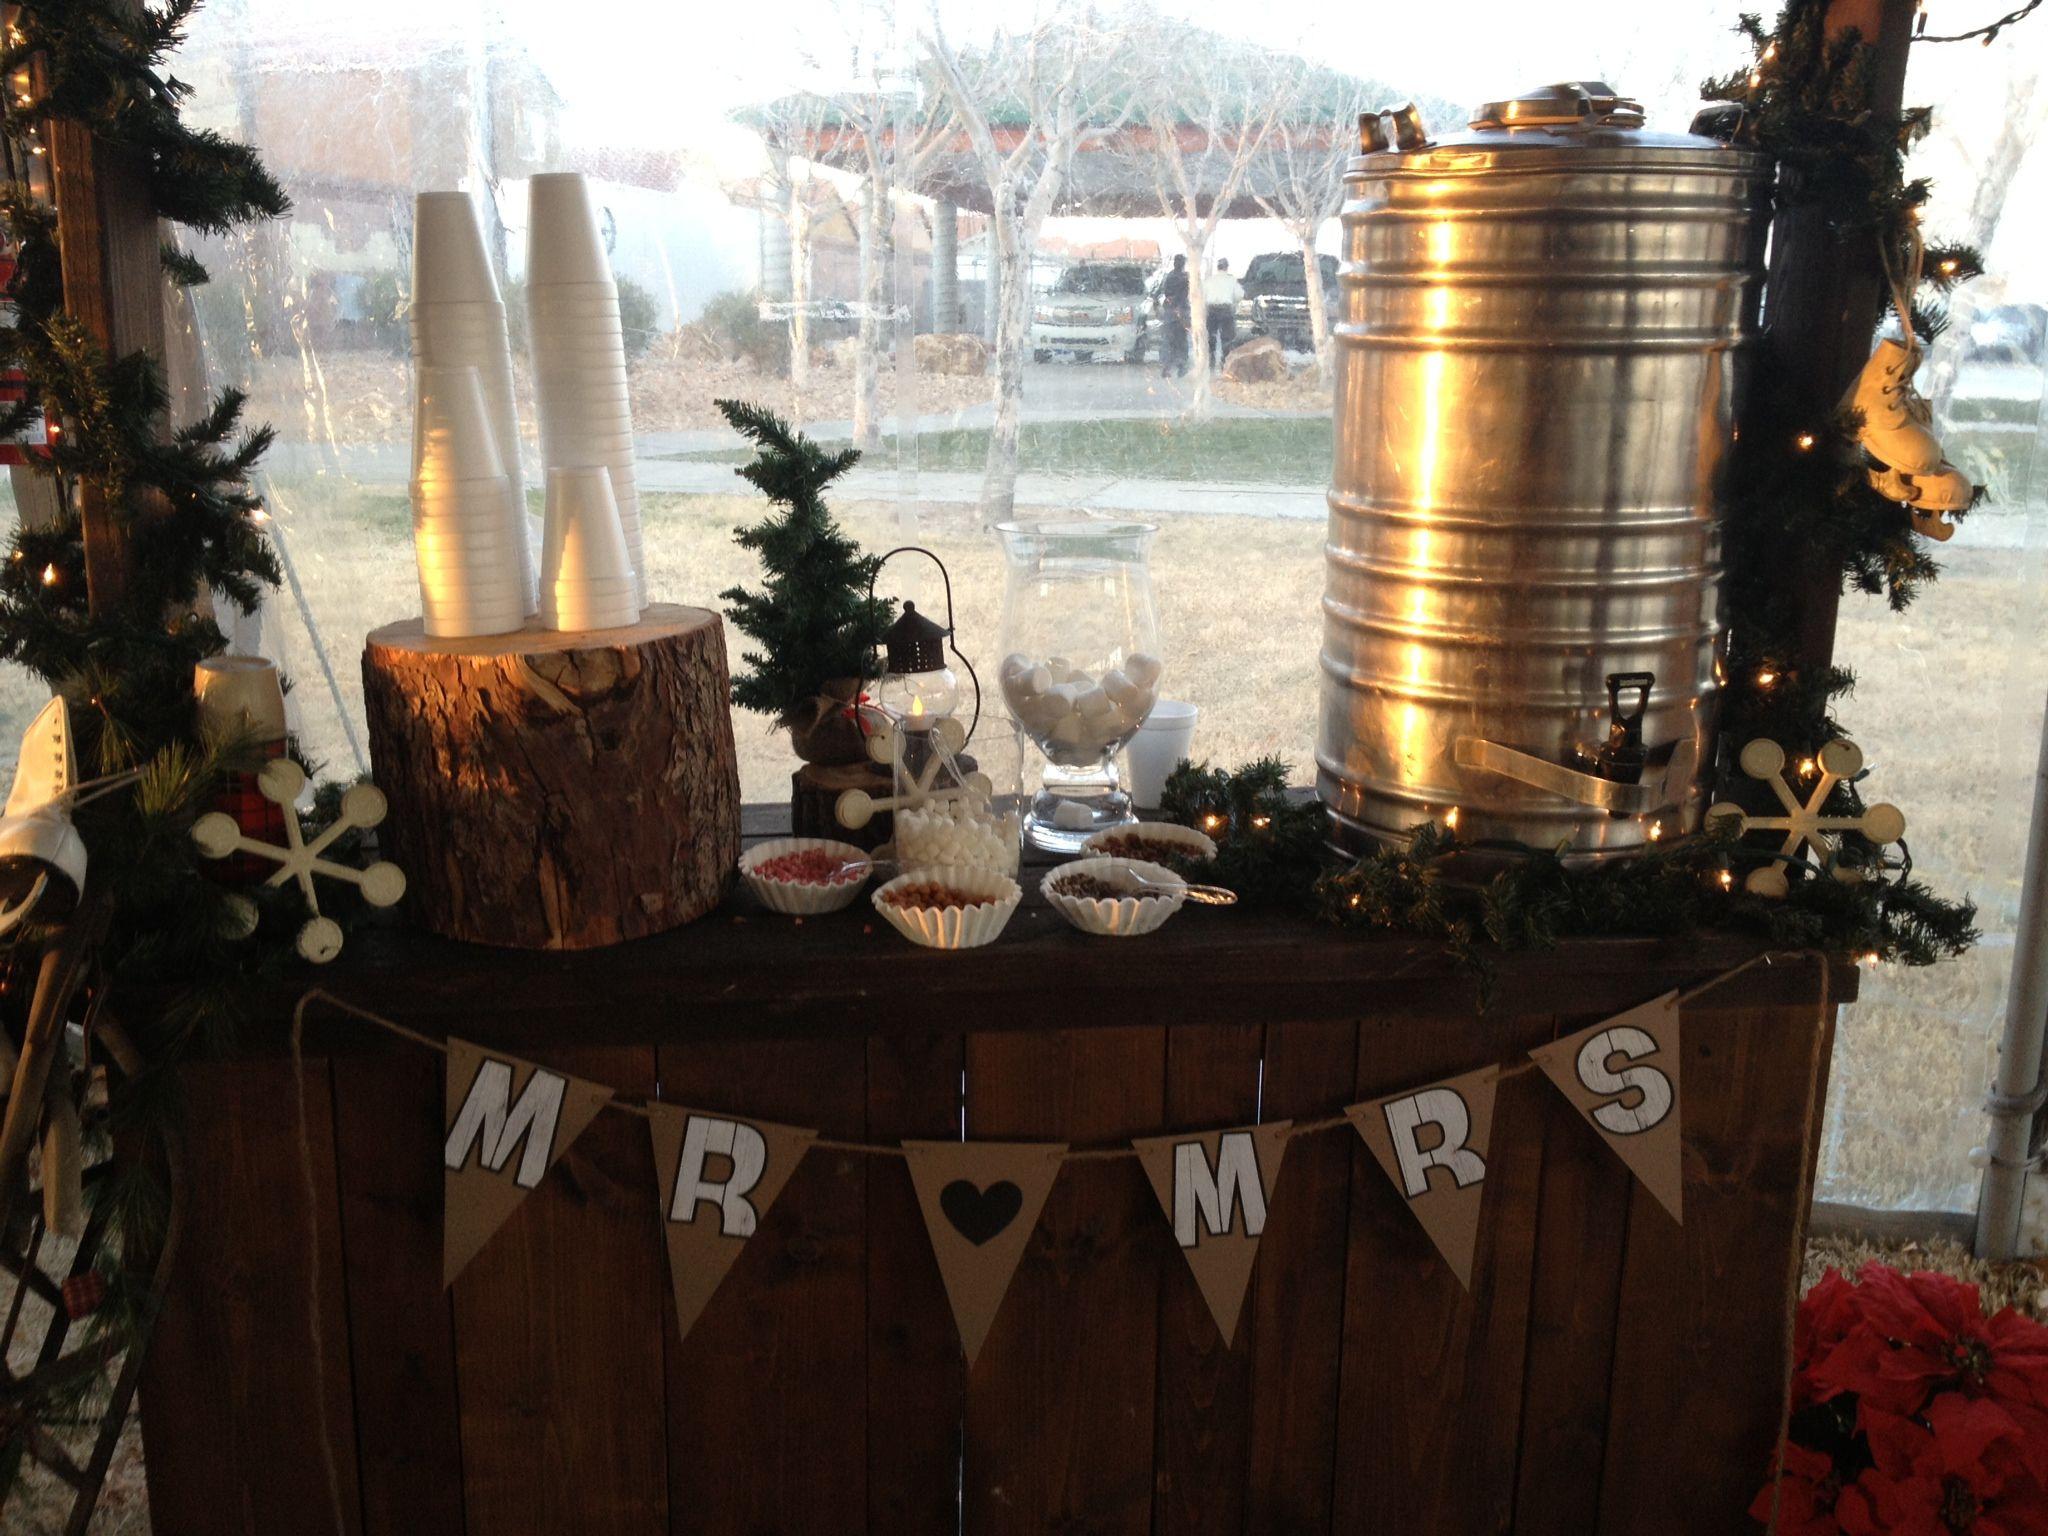 Rustic wedding decor. hot cocoa stand